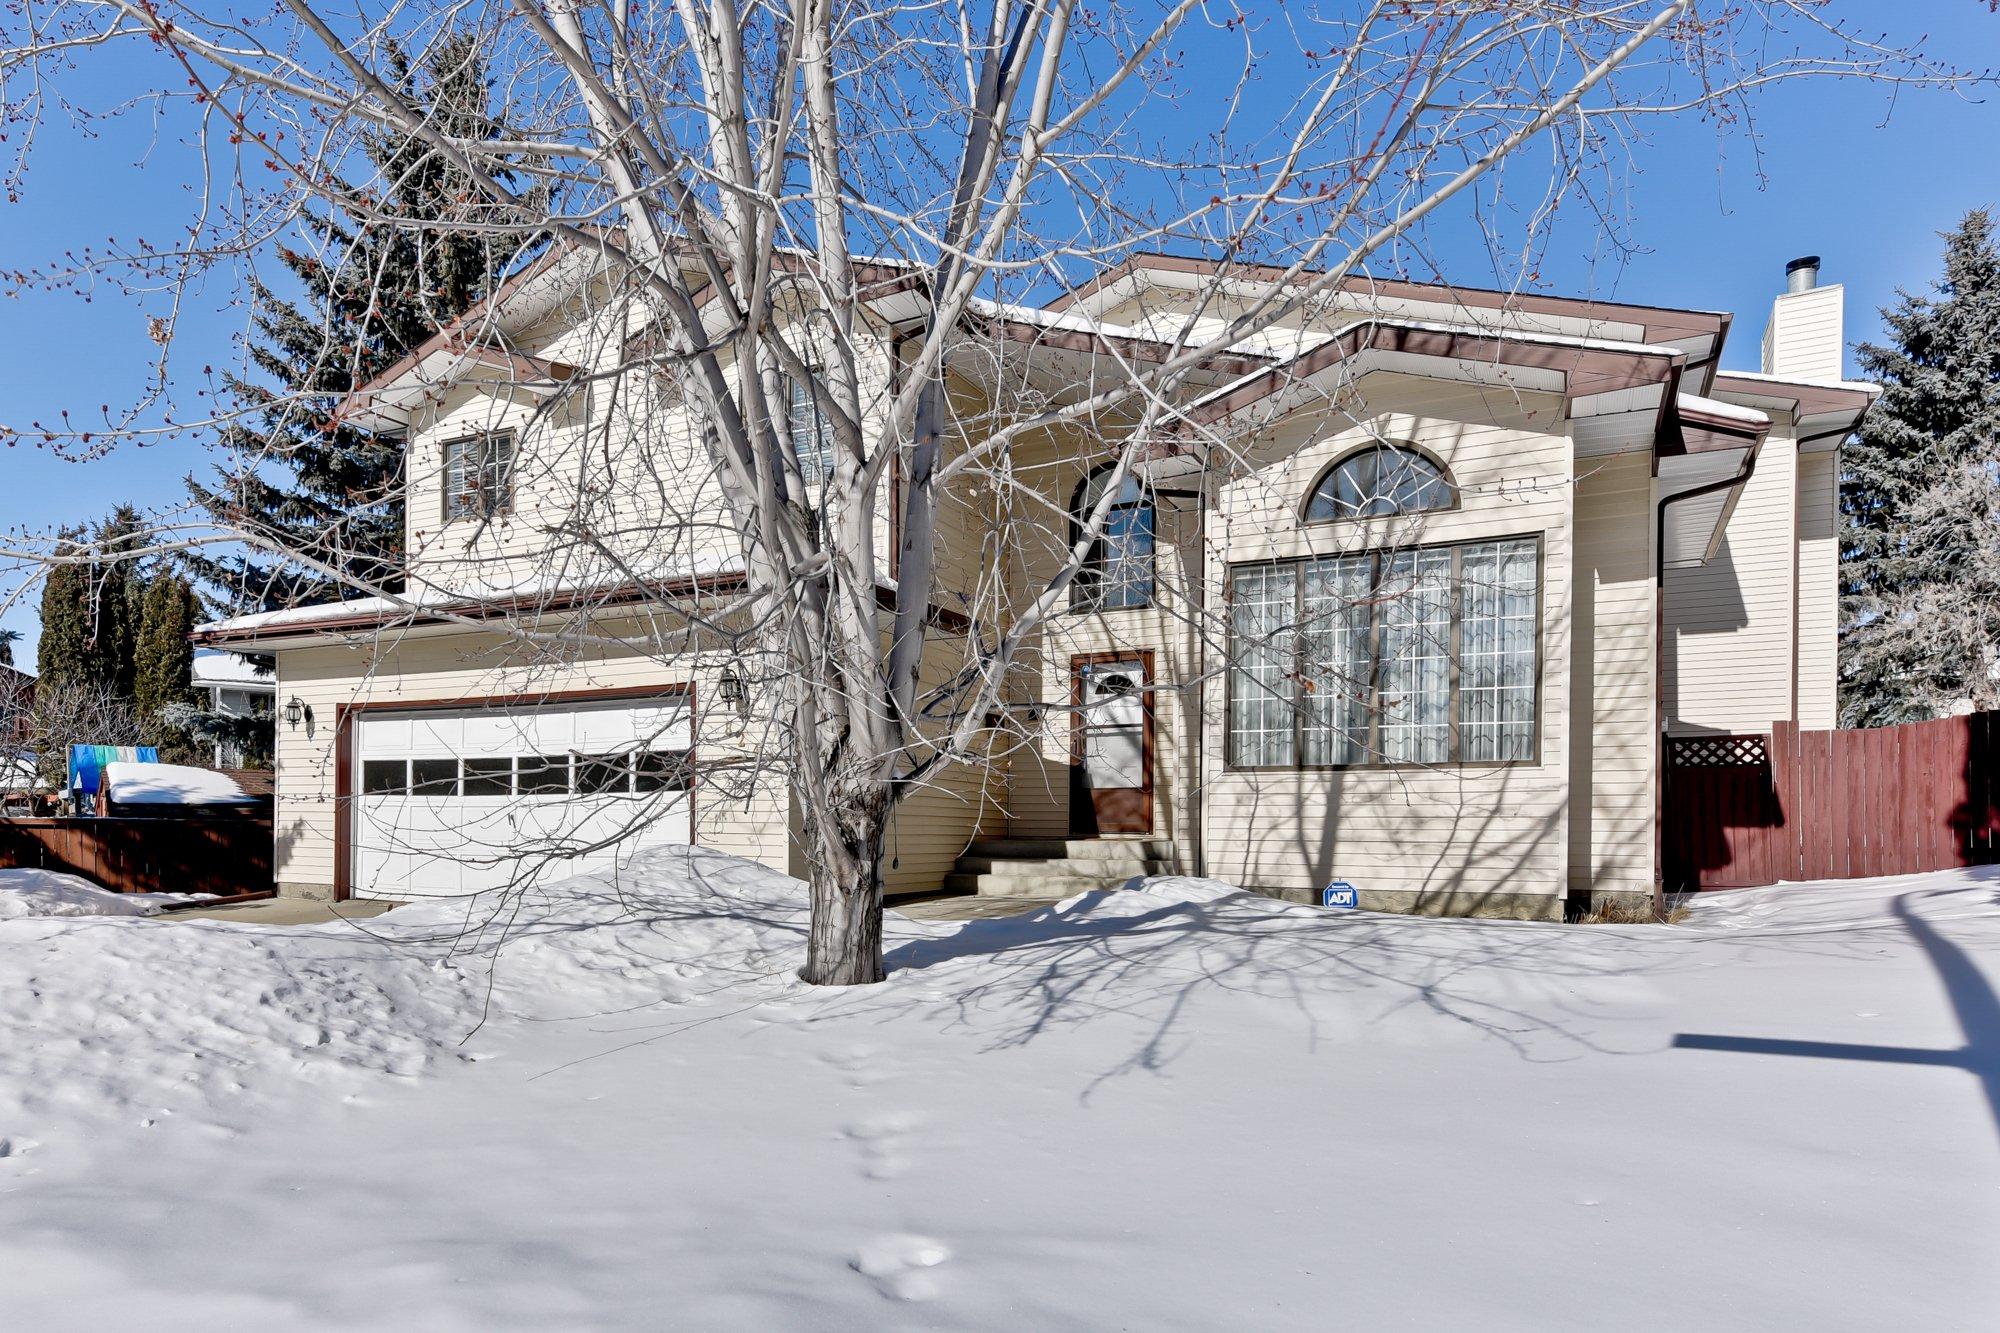 Main Photo: 824 Richards Crescent in Edmonton: House for sale